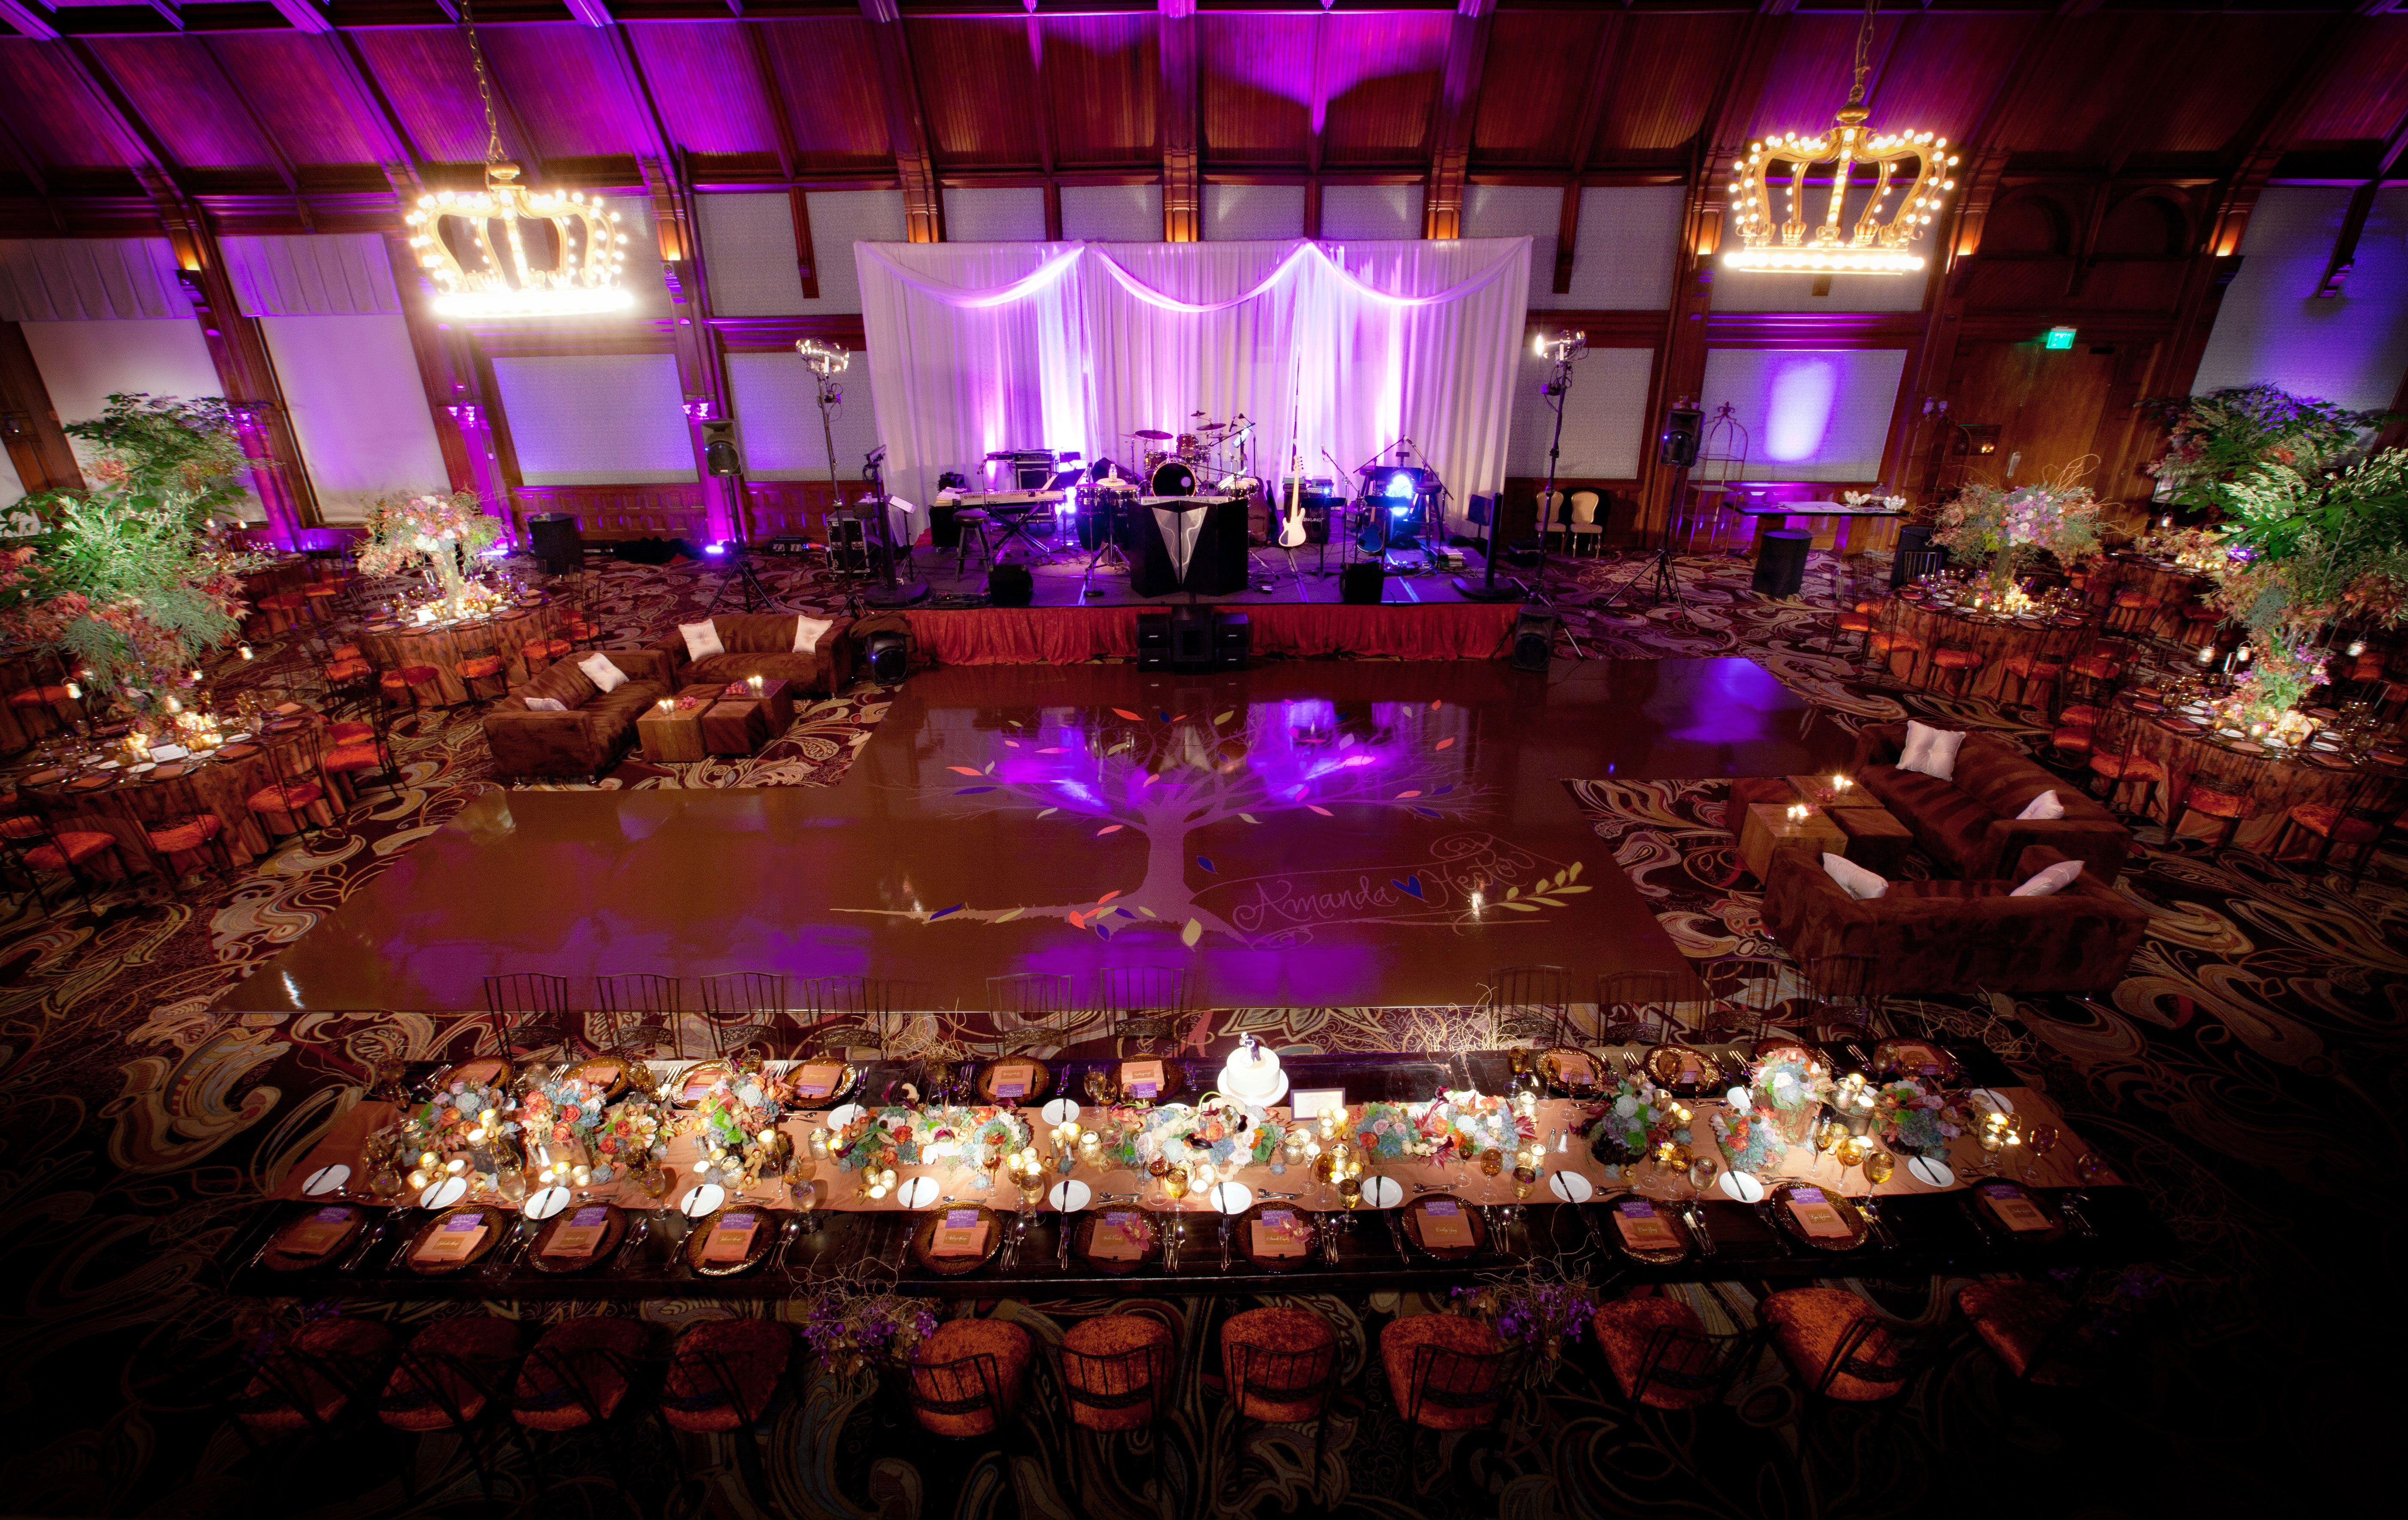 Chocolate Brown Custom Seamless Dance Floor At The Hotel Del Coronado Crown Room Wedding